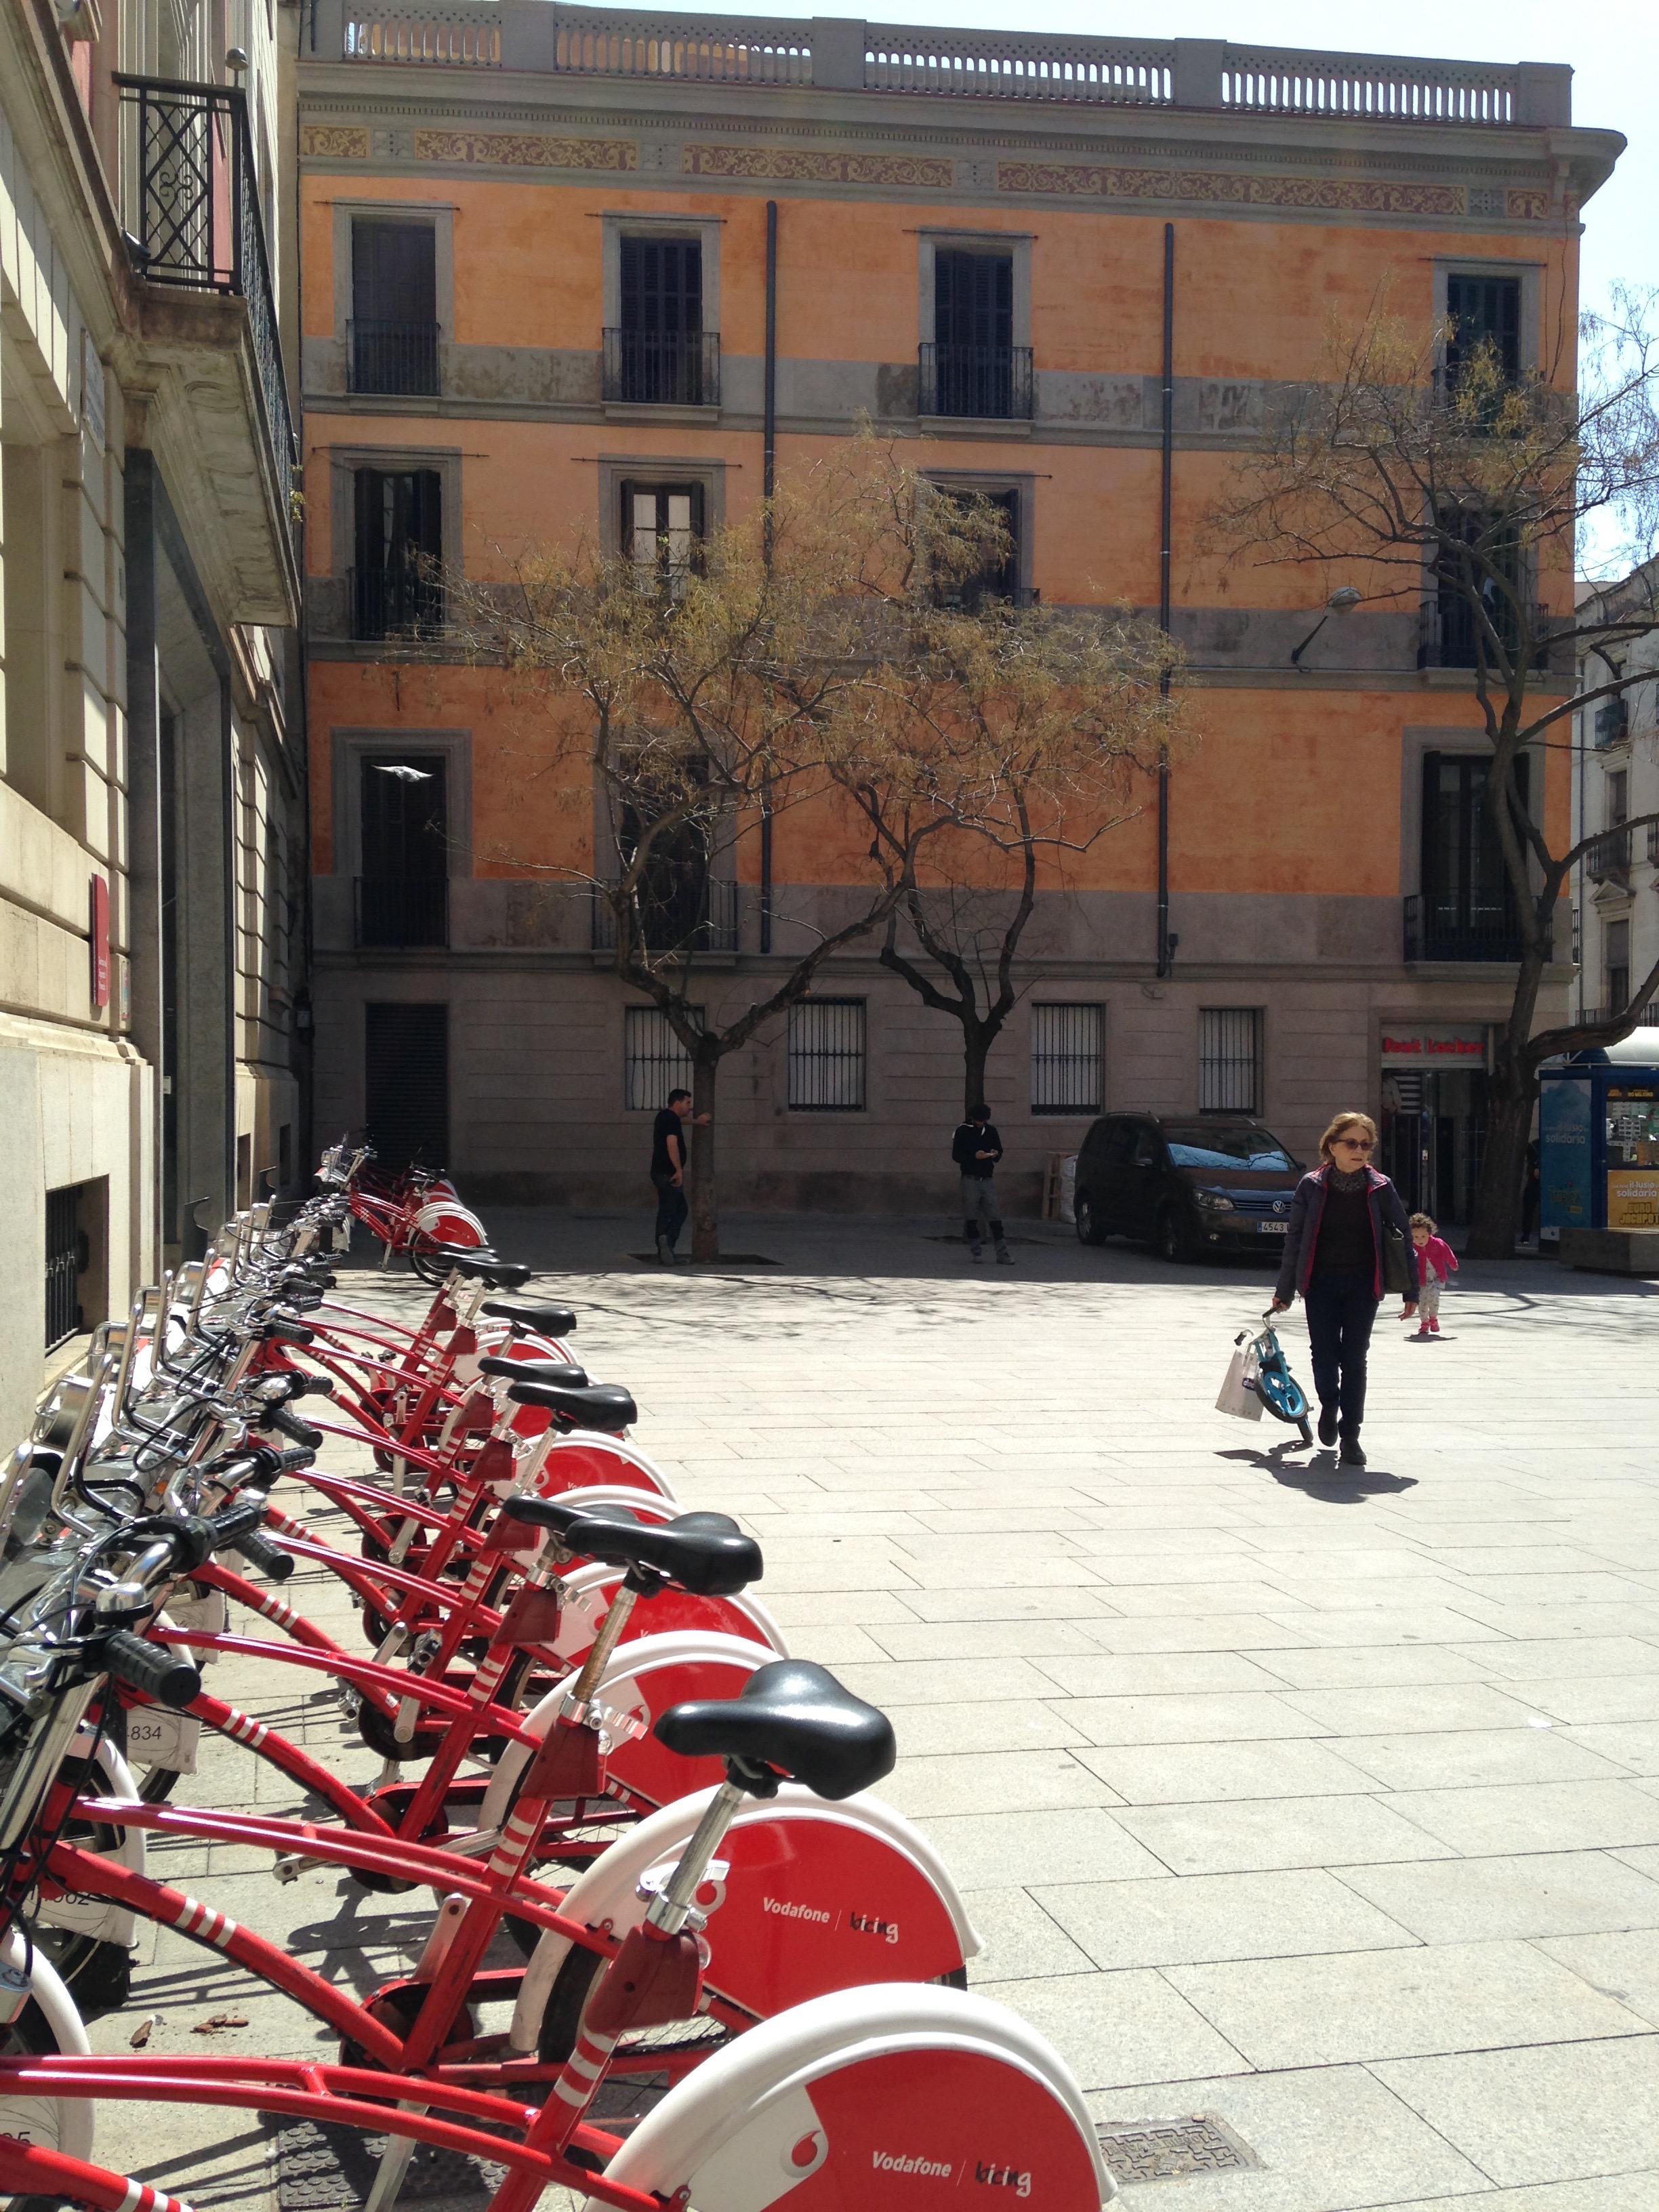 public bicycles - Barcelona